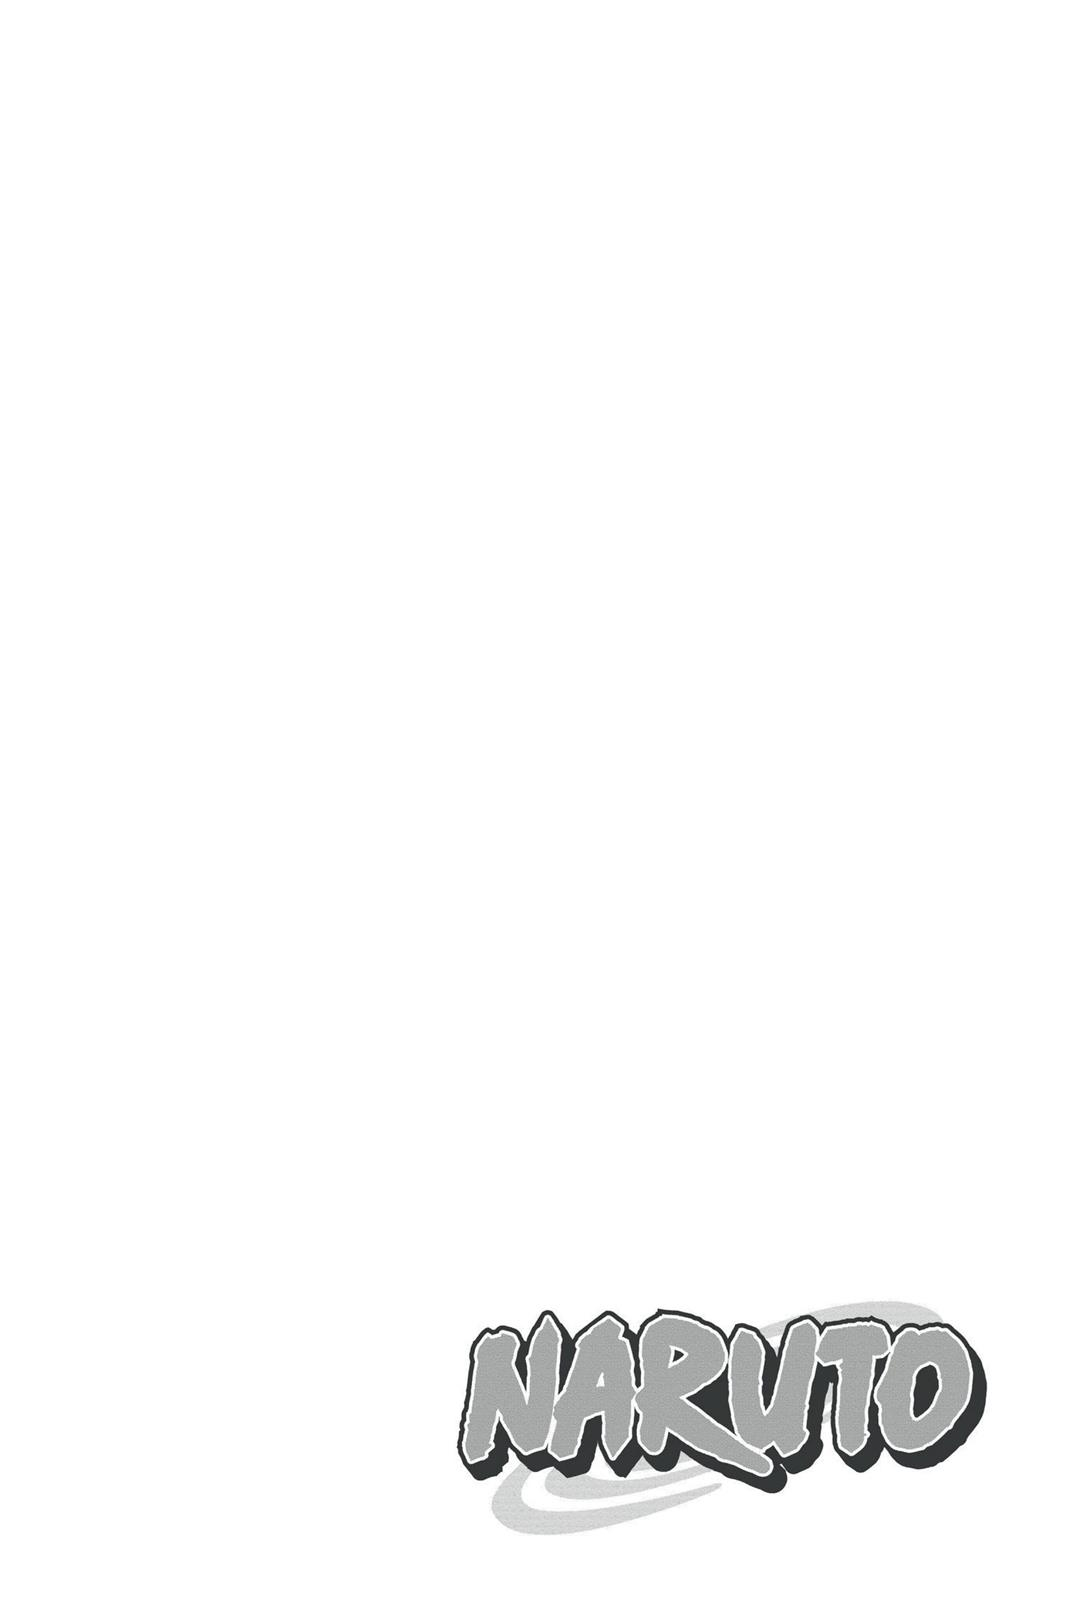 Naruto, Chapter 347 image 018